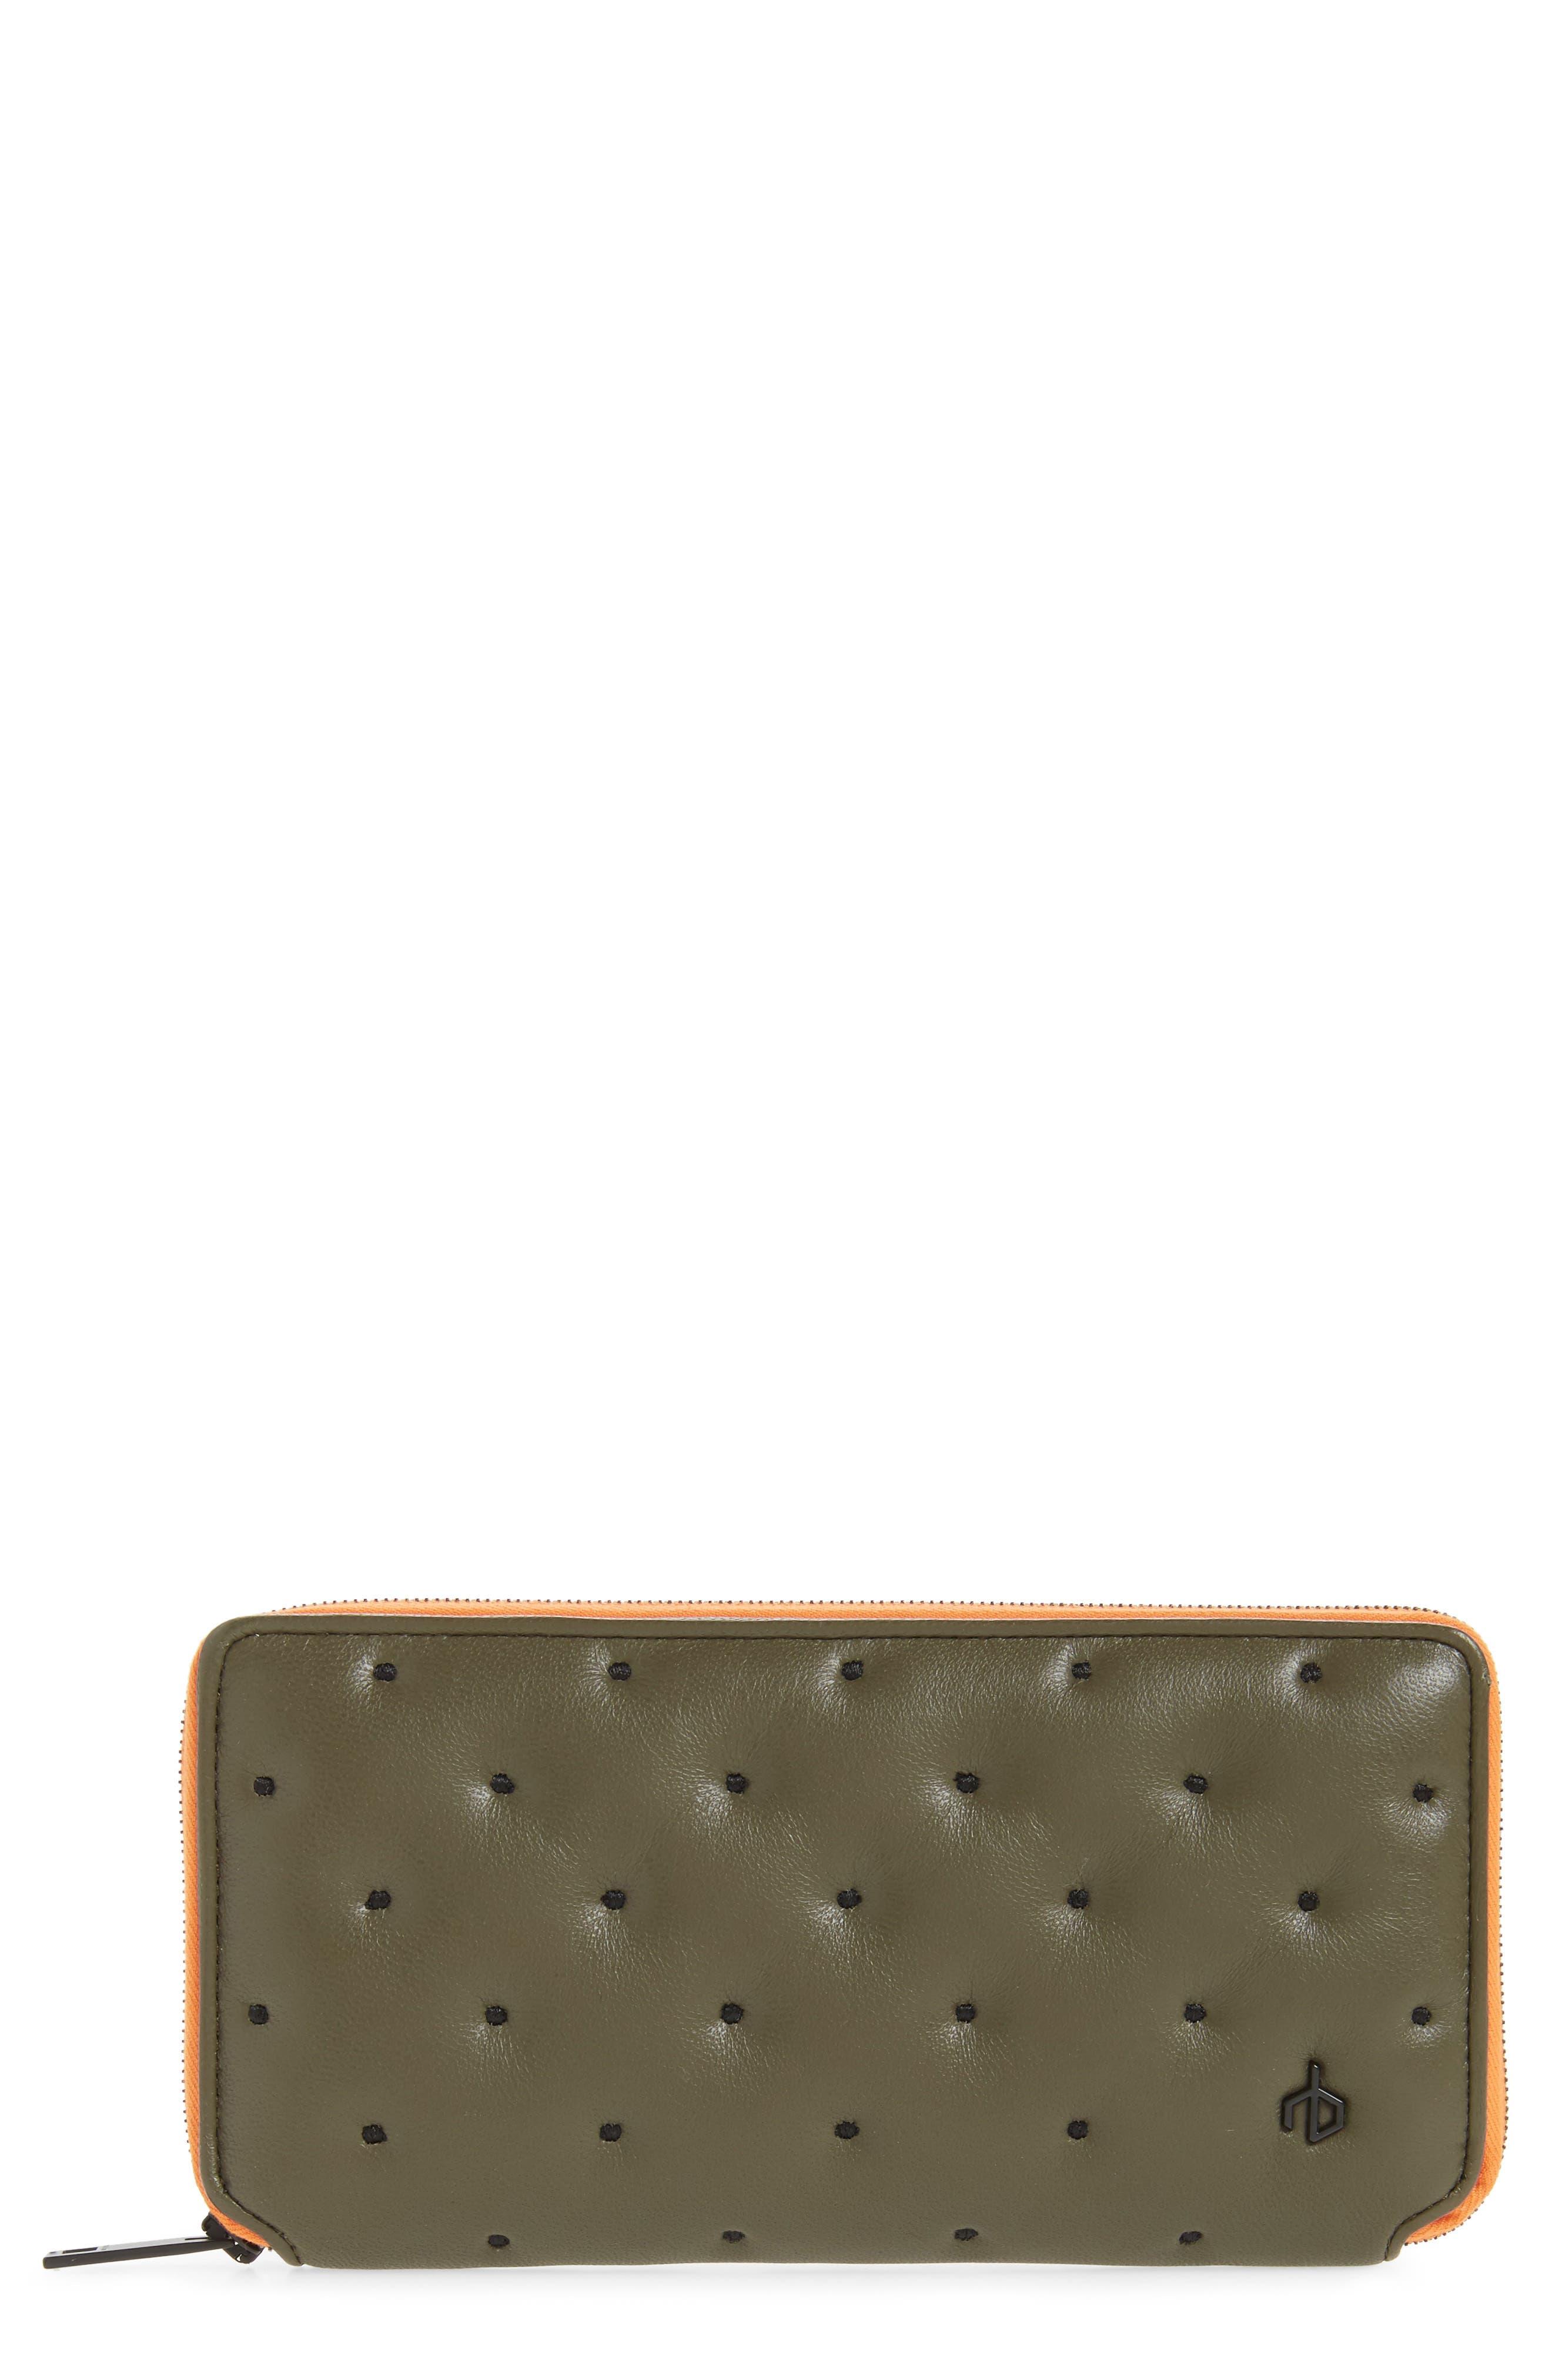 Main Image - rag & bone Dot Dash Quilted Leather Zip Around Wallet